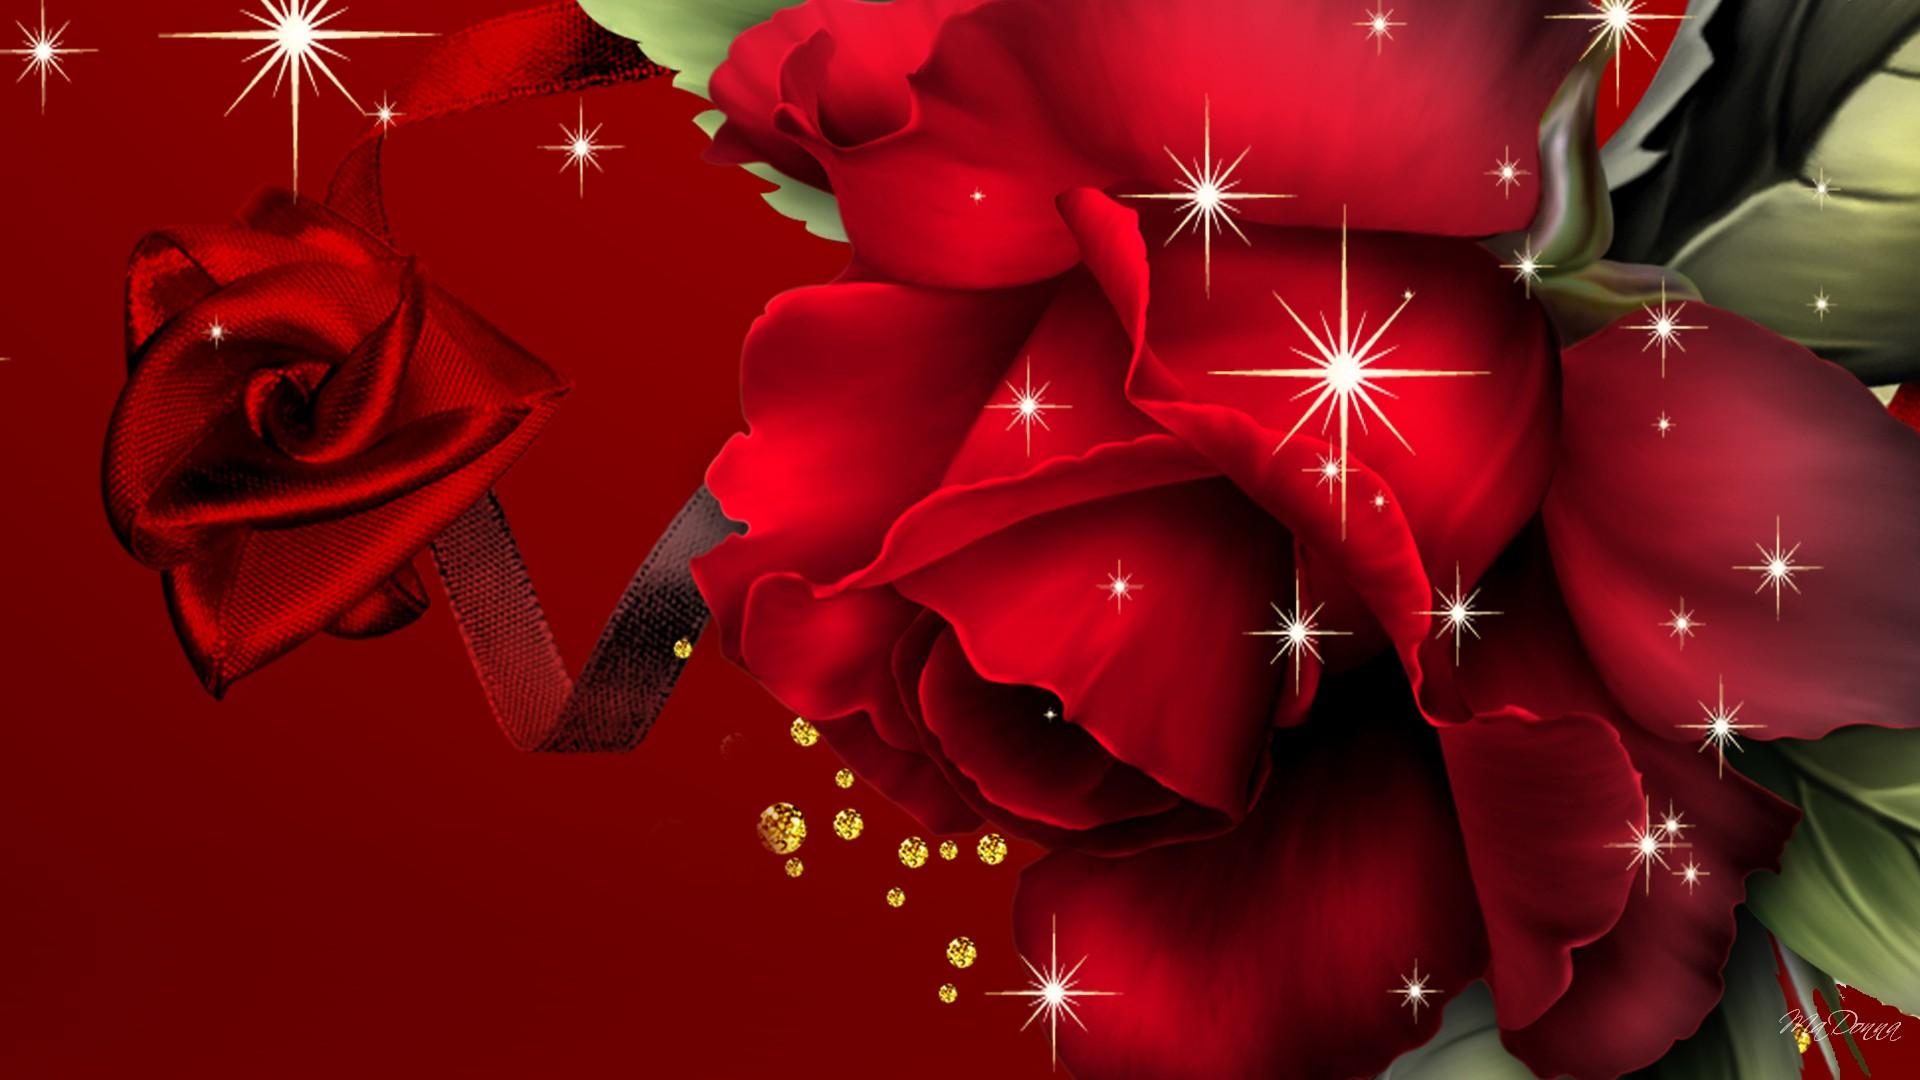 Big 3d Wallpapers For Desktop Red Roses Free Wallpapers Hd Top Hd Wallpaper